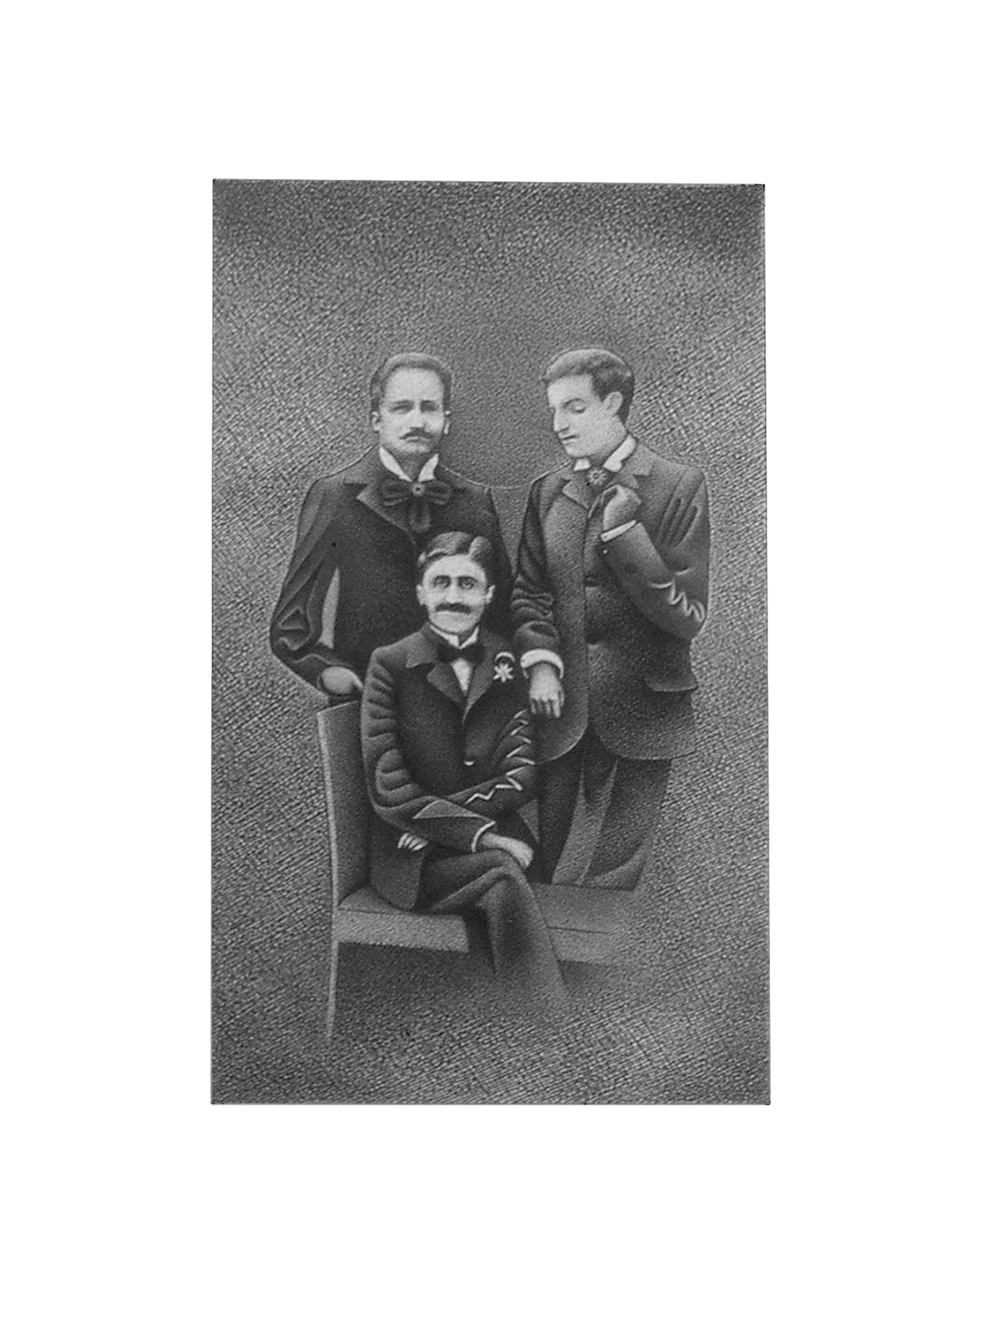 Trevor Skinner Marcel and friends - Sóc Sant Feliu de Guíxols